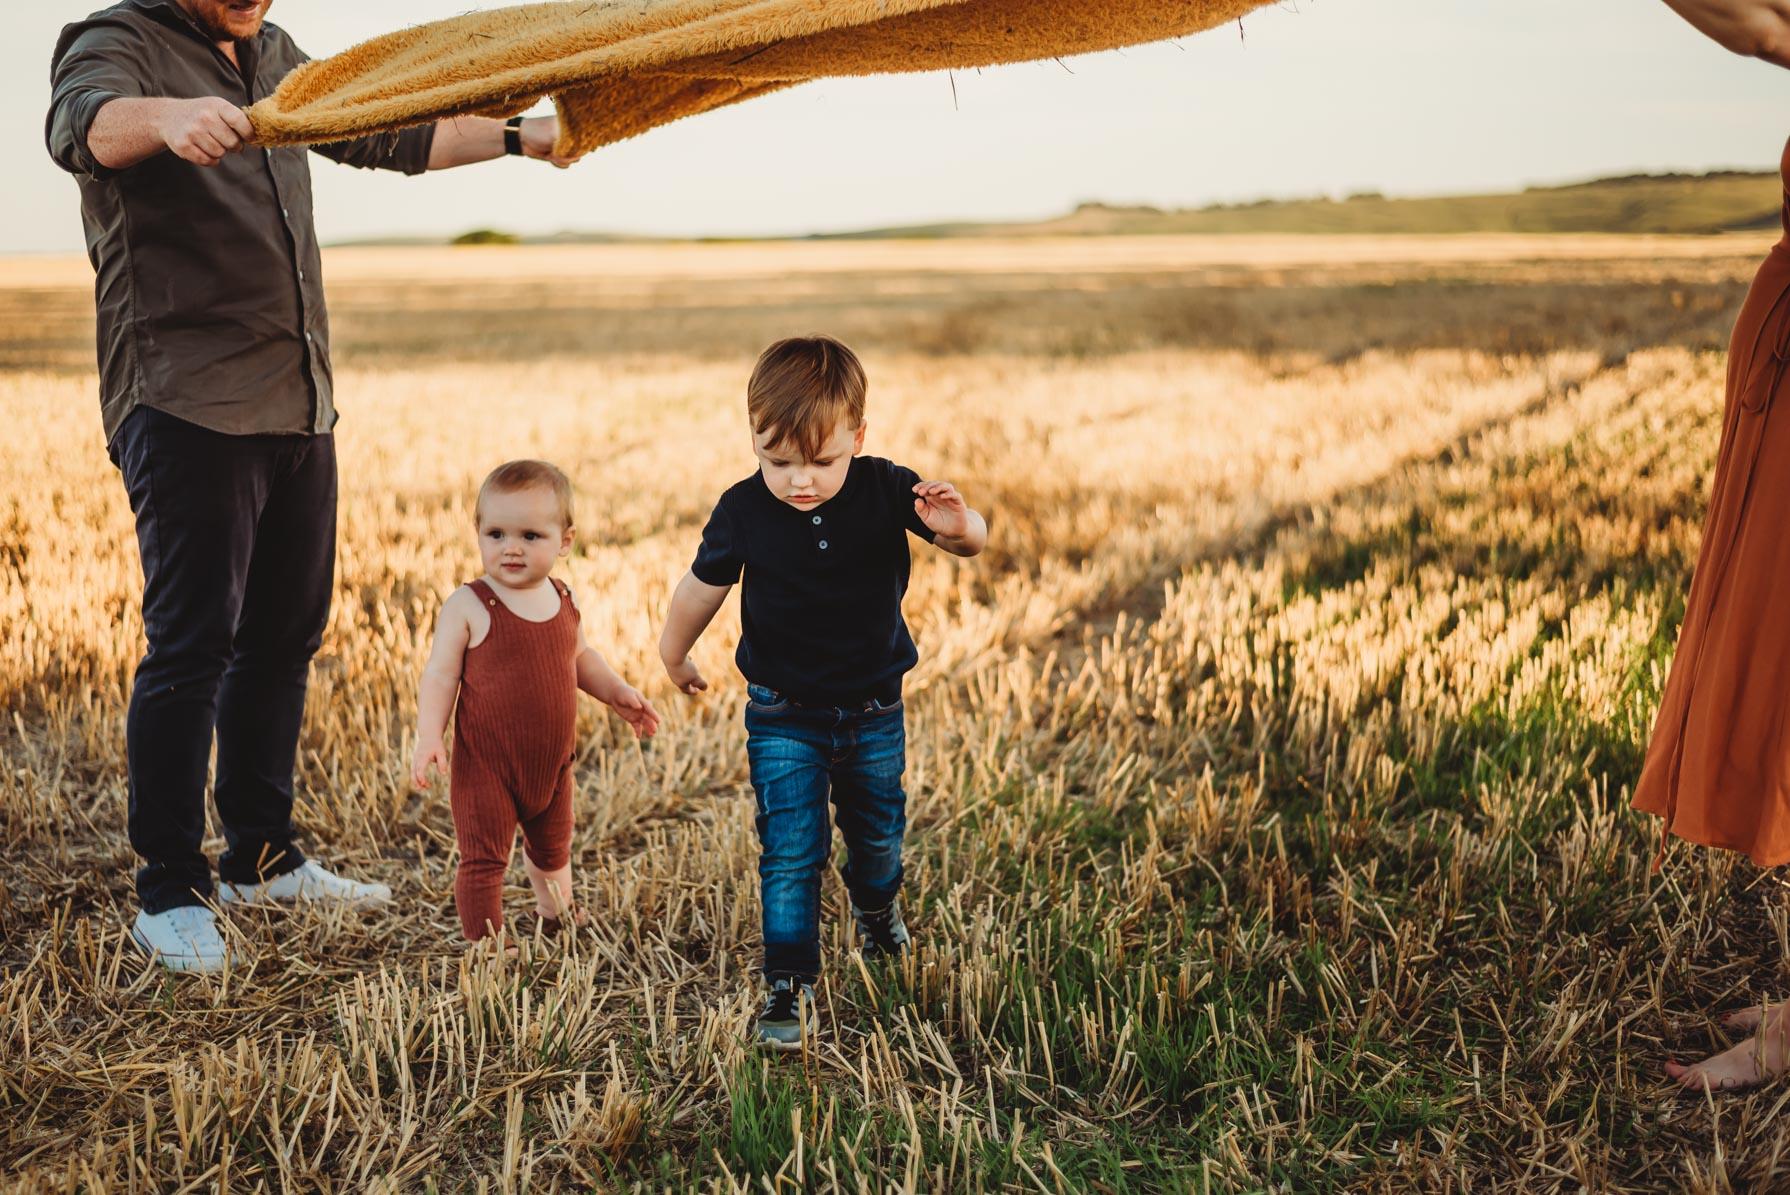 two children in a golden crop field running under a blanket held up by their parents